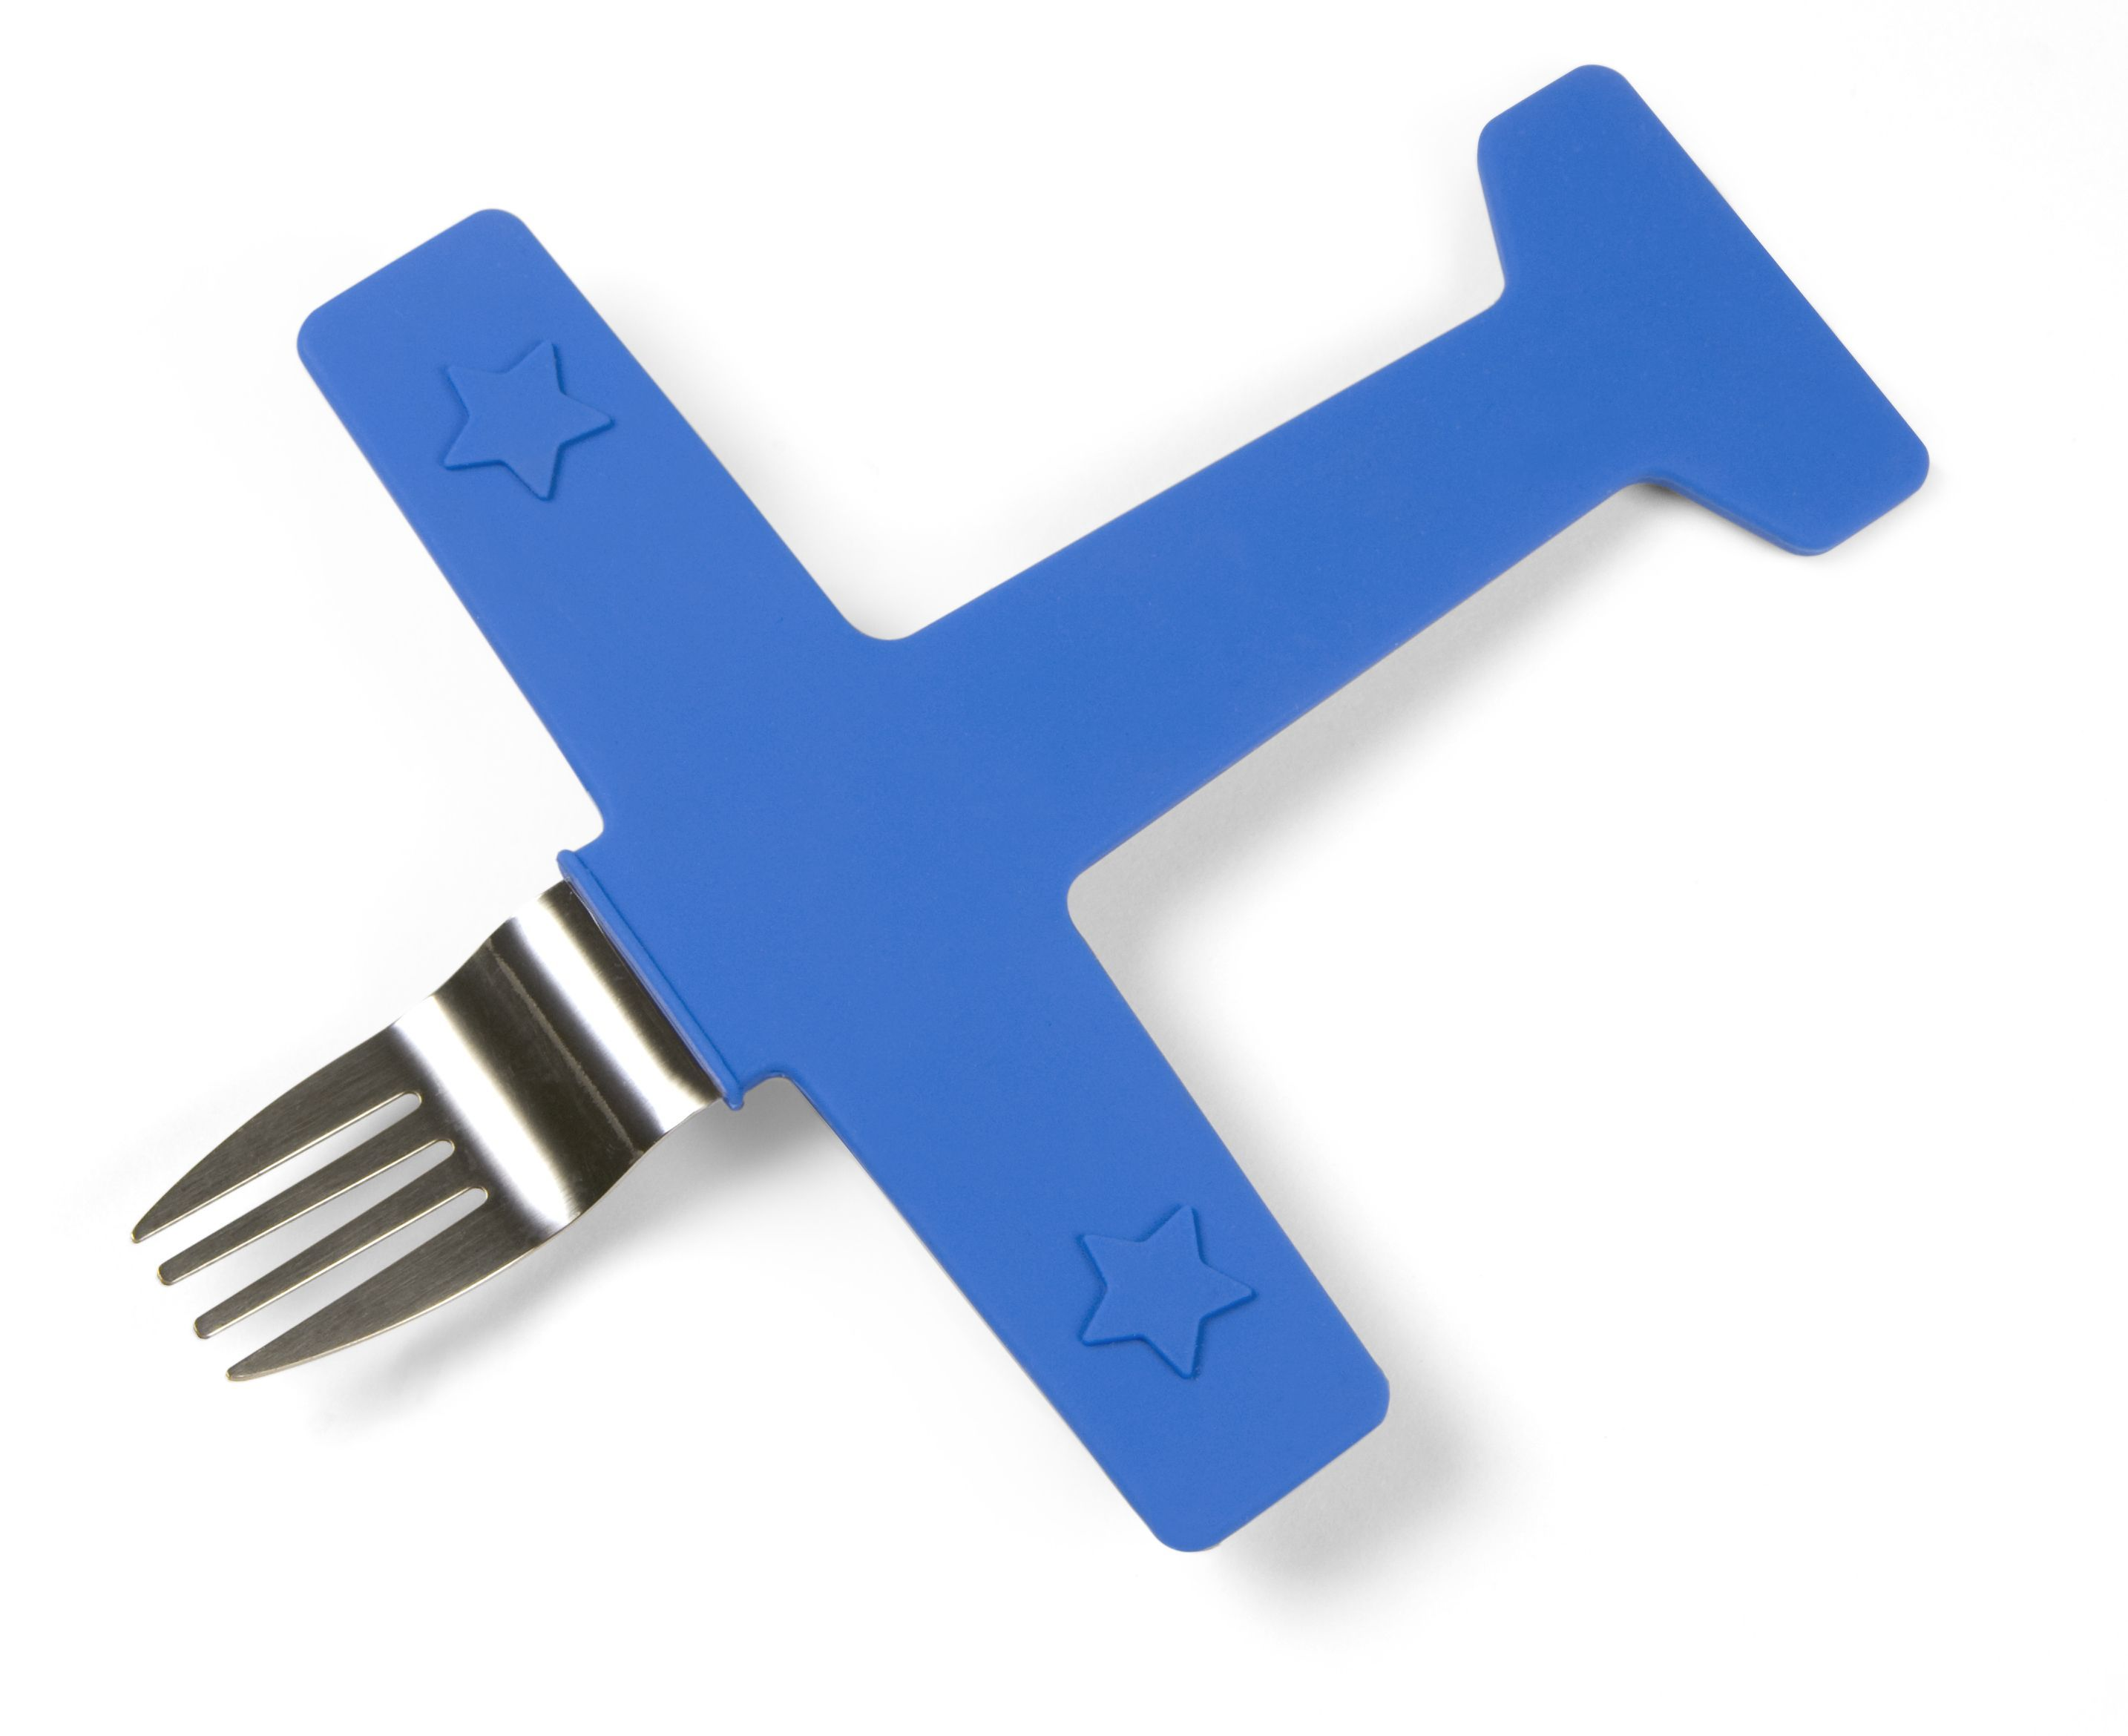 Вилка - Самолет (AIRFORK ONE)